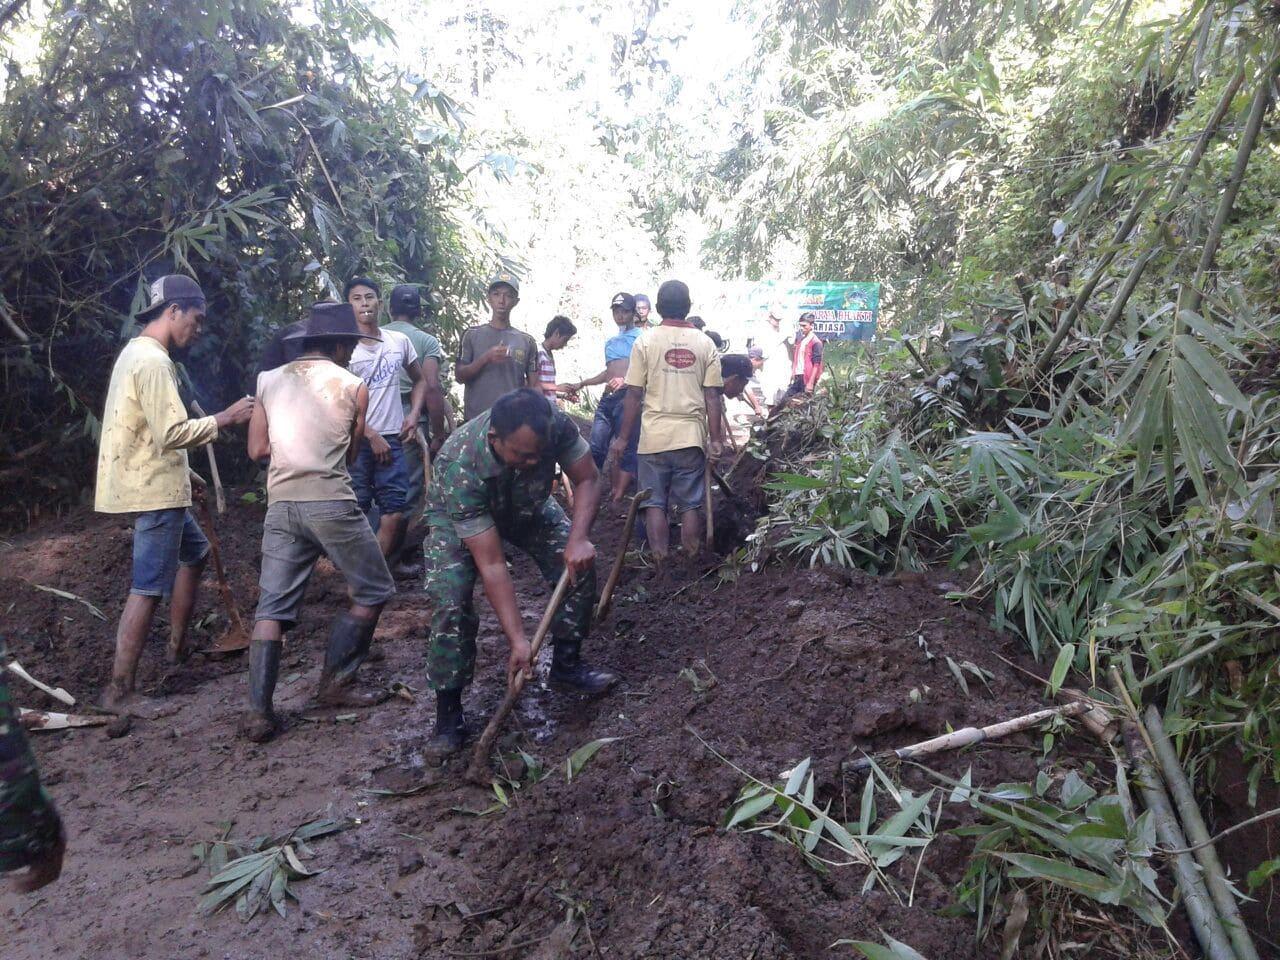 Tanggap Bencana Koramil 02/Arjasa dan Koramil 26/ Jelbuk Gelar Karya Bakti Bersama Masyarakat